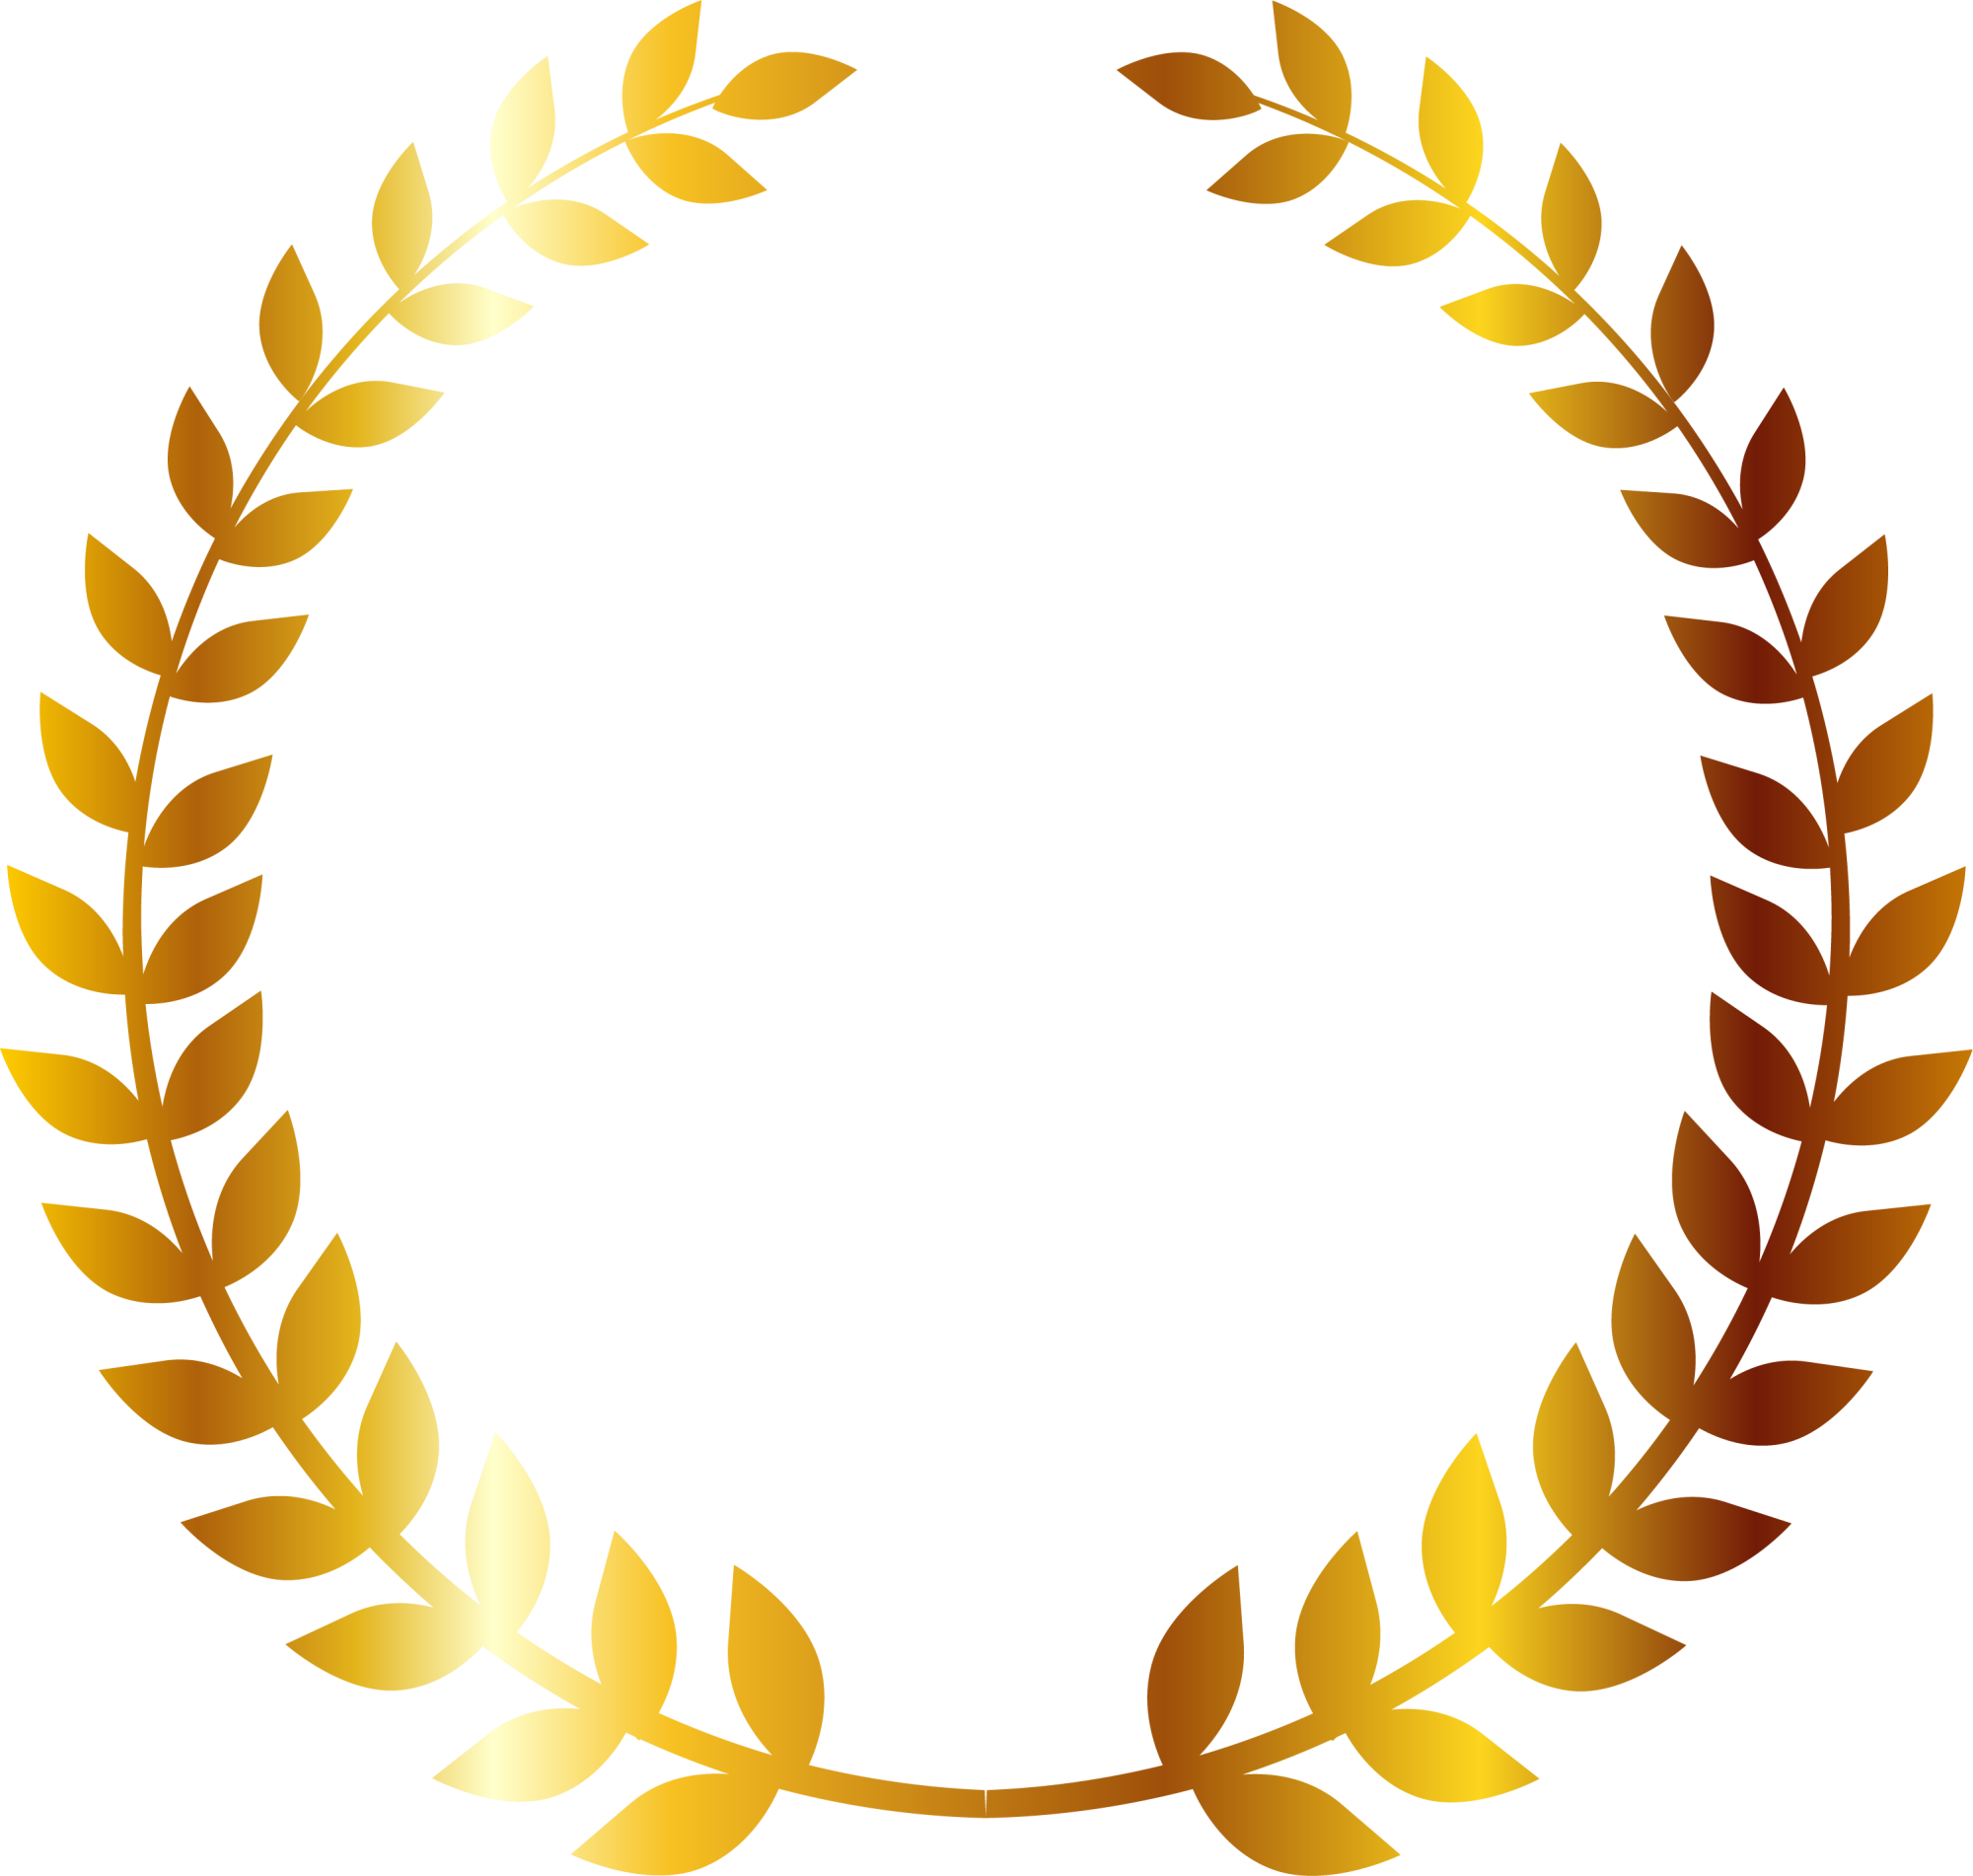 Paper company monogram logo. Wheat clipart circle